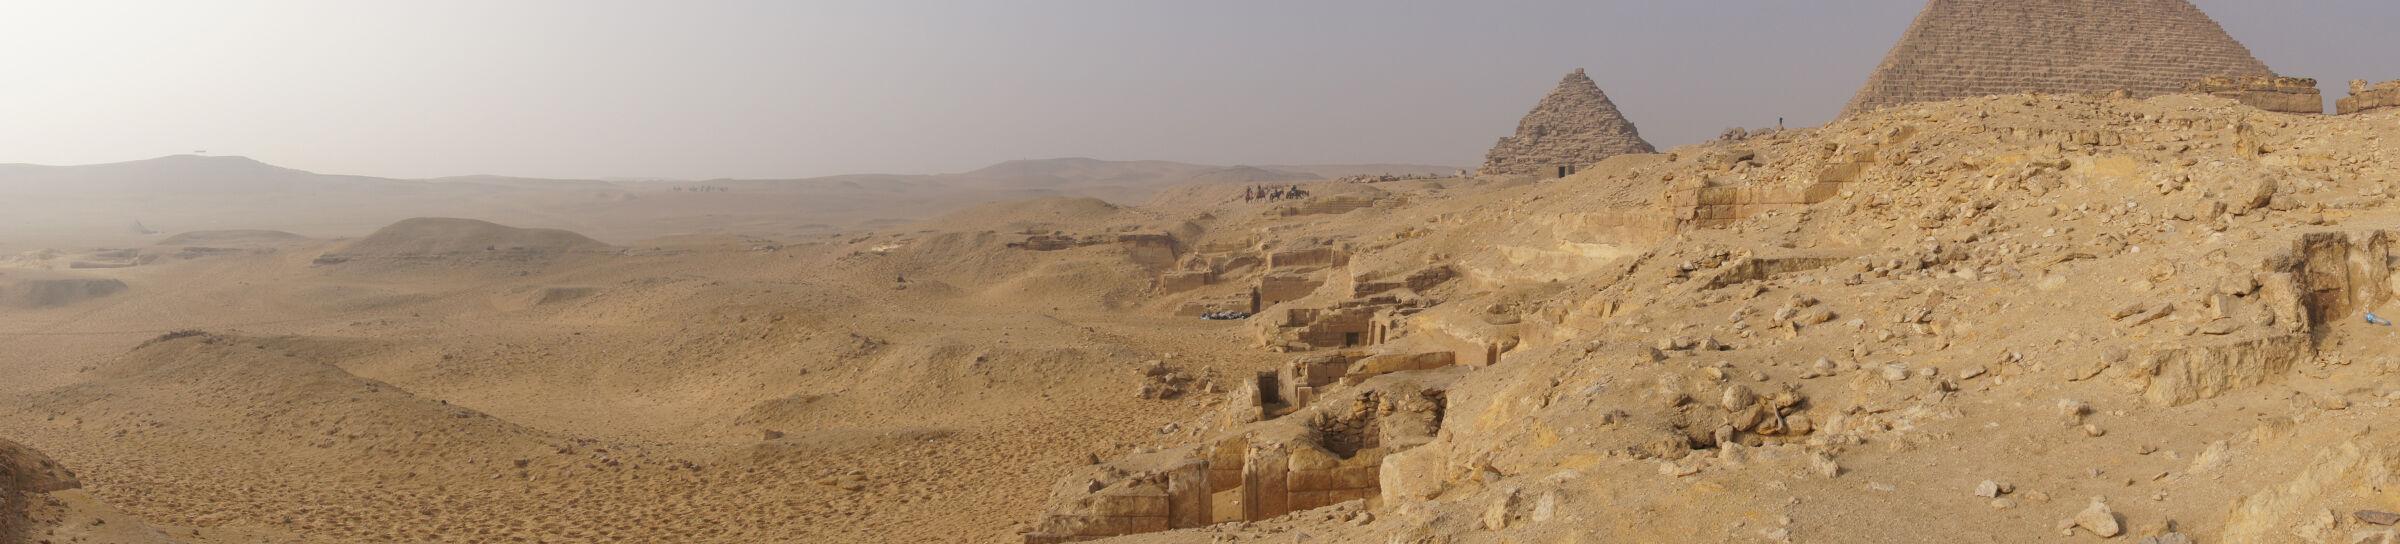 Menkaure Quarry Cemetery: Site: Giza; View: MQ 502, MQ 500, MQ 501(?), MQ 102, MQ 131, MQ 132, MQ 133, MQ 101(?), MQ 130, MQ 121, MQ 120, MQ 134, MQ 135, MQ 105, MQ 124, MQ 123, MQ 106, MQ 136, MQ 1, G III-a, Menkaure Pyramid